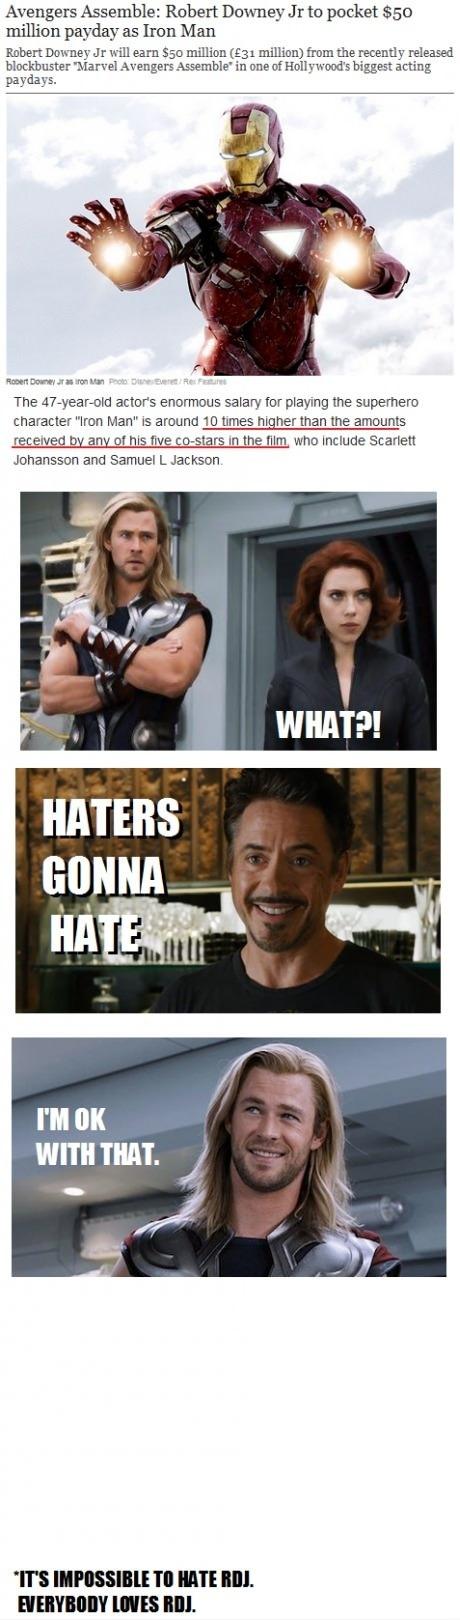 Everybody Loves Robert Downey Jr.